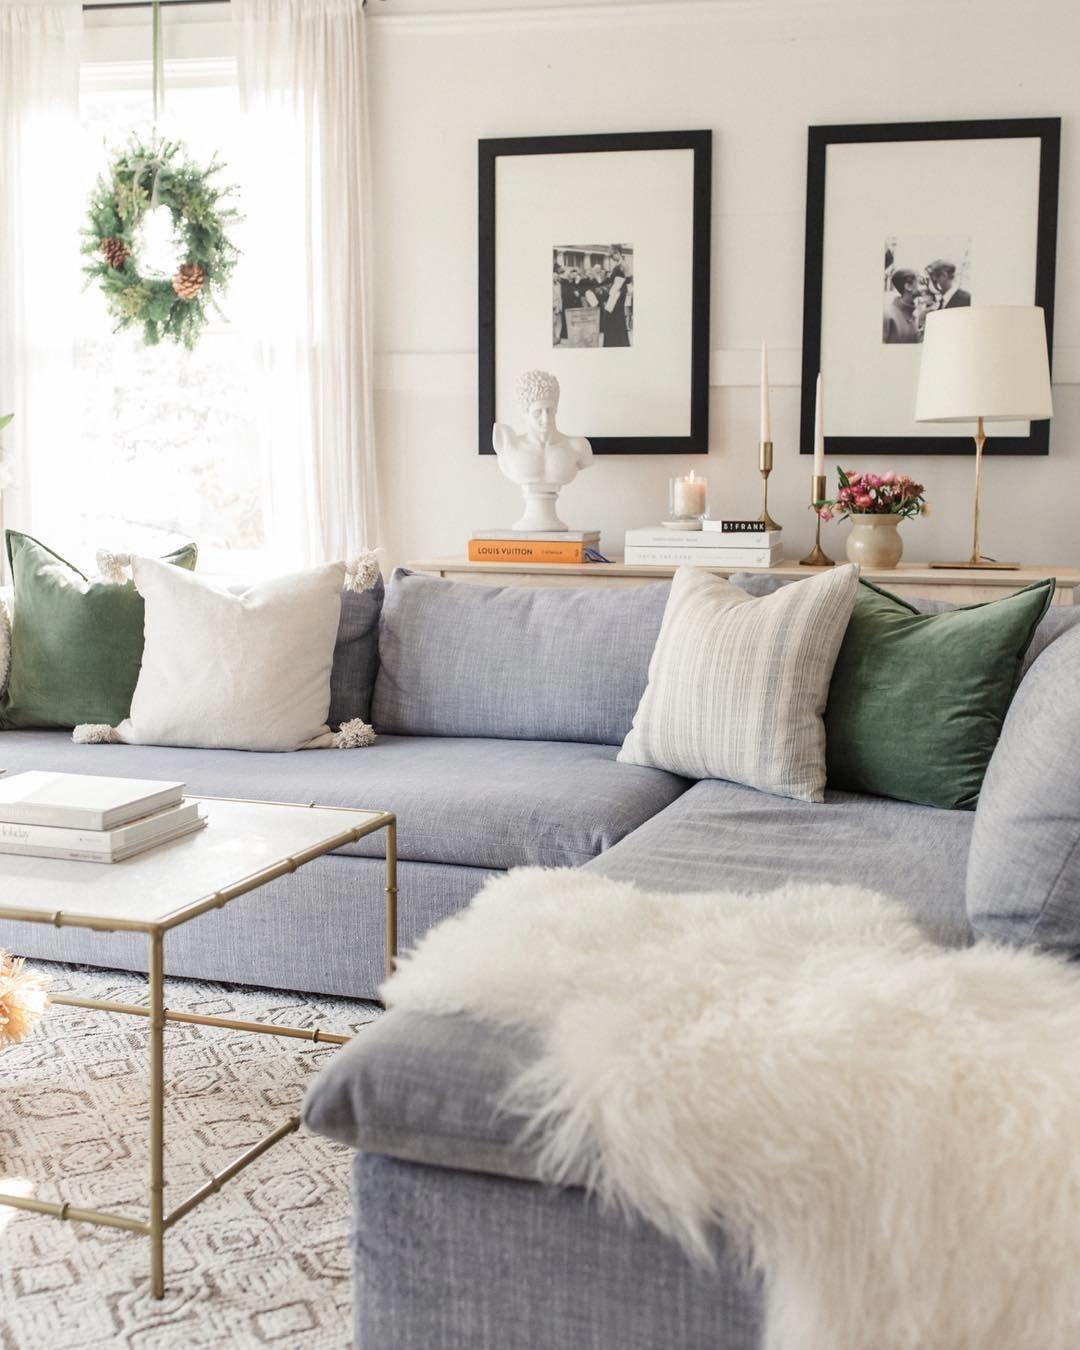 Scandinavian Decorideas: Your Living Room Decor Will Never Be The Same